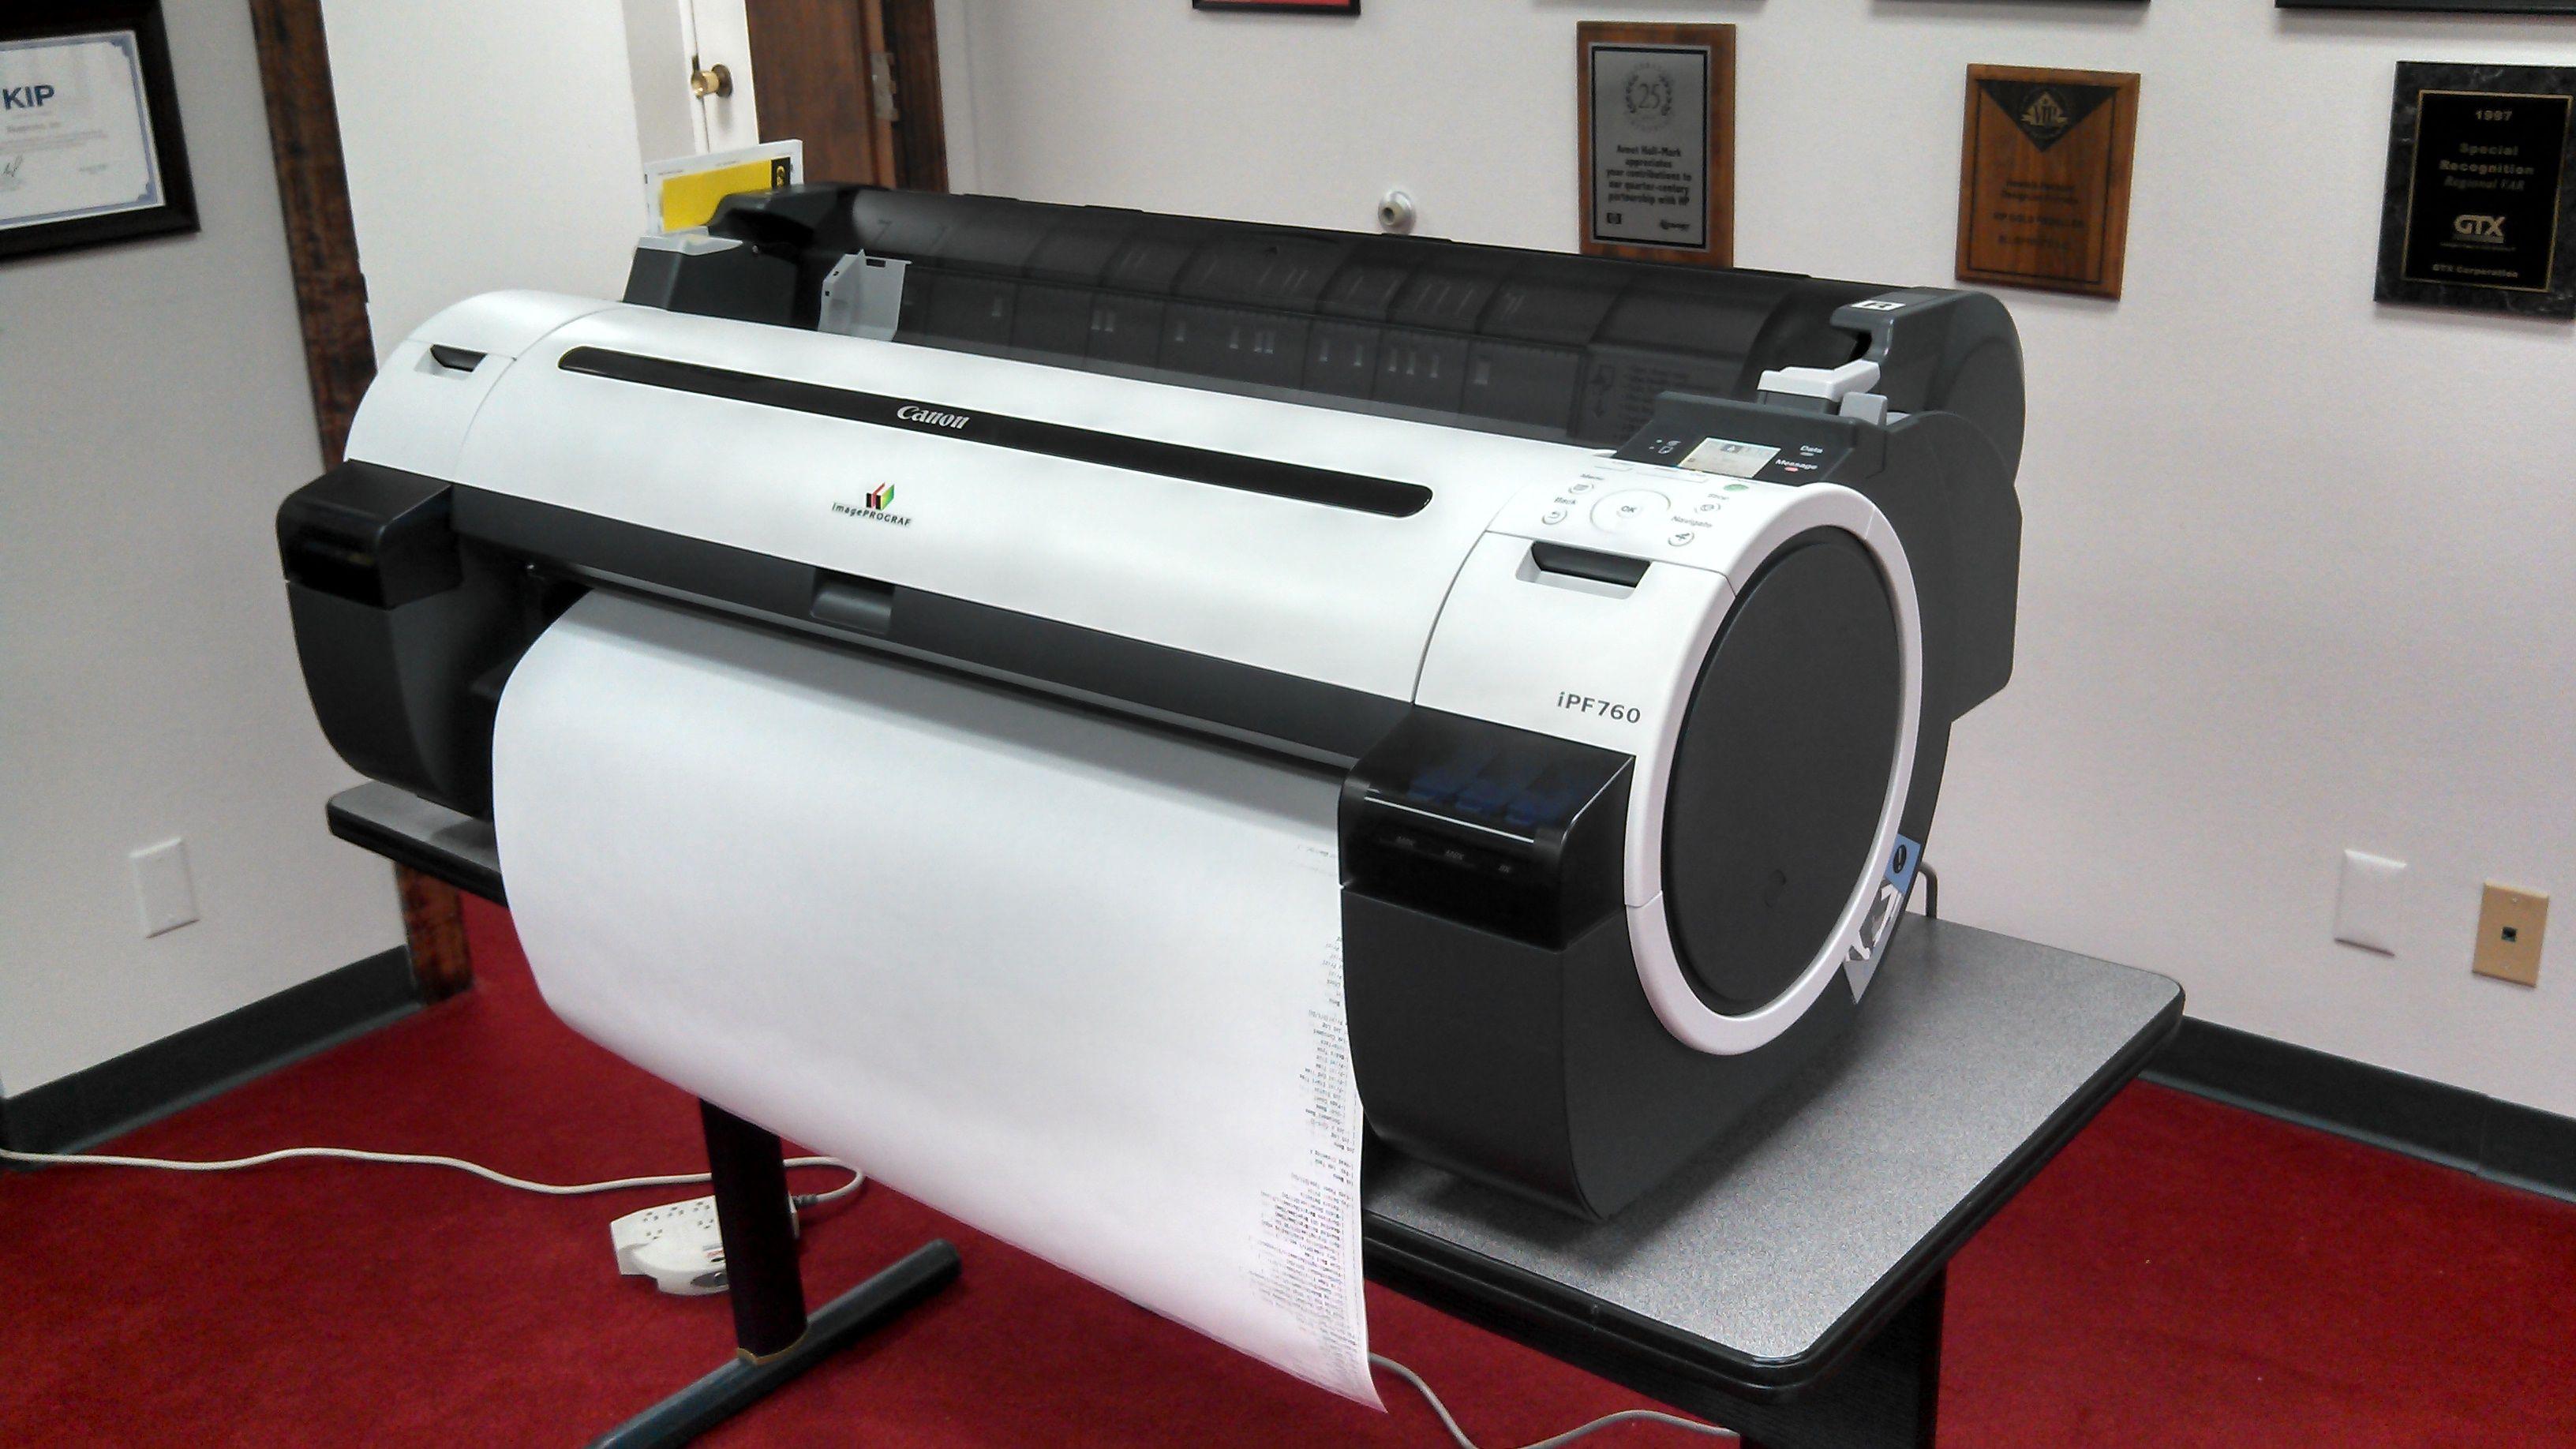 Canon ipf series inkjet printer.